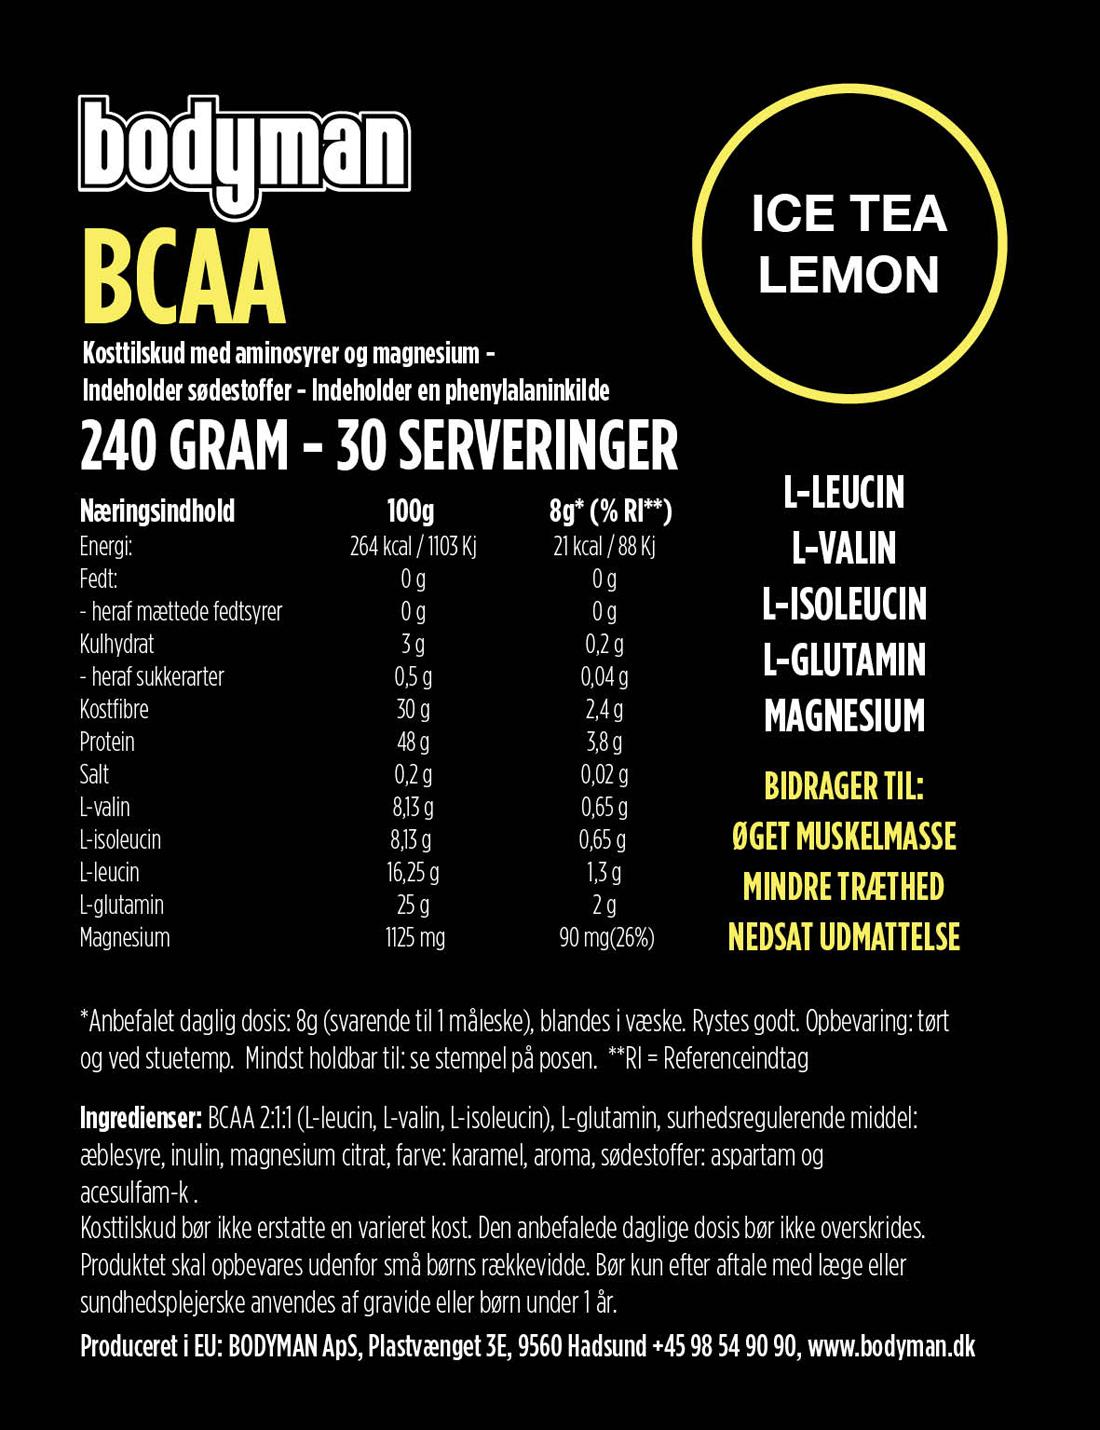 Bodyman BCAA Ice Tea Lemon 240 Gram fås hos Bodyman